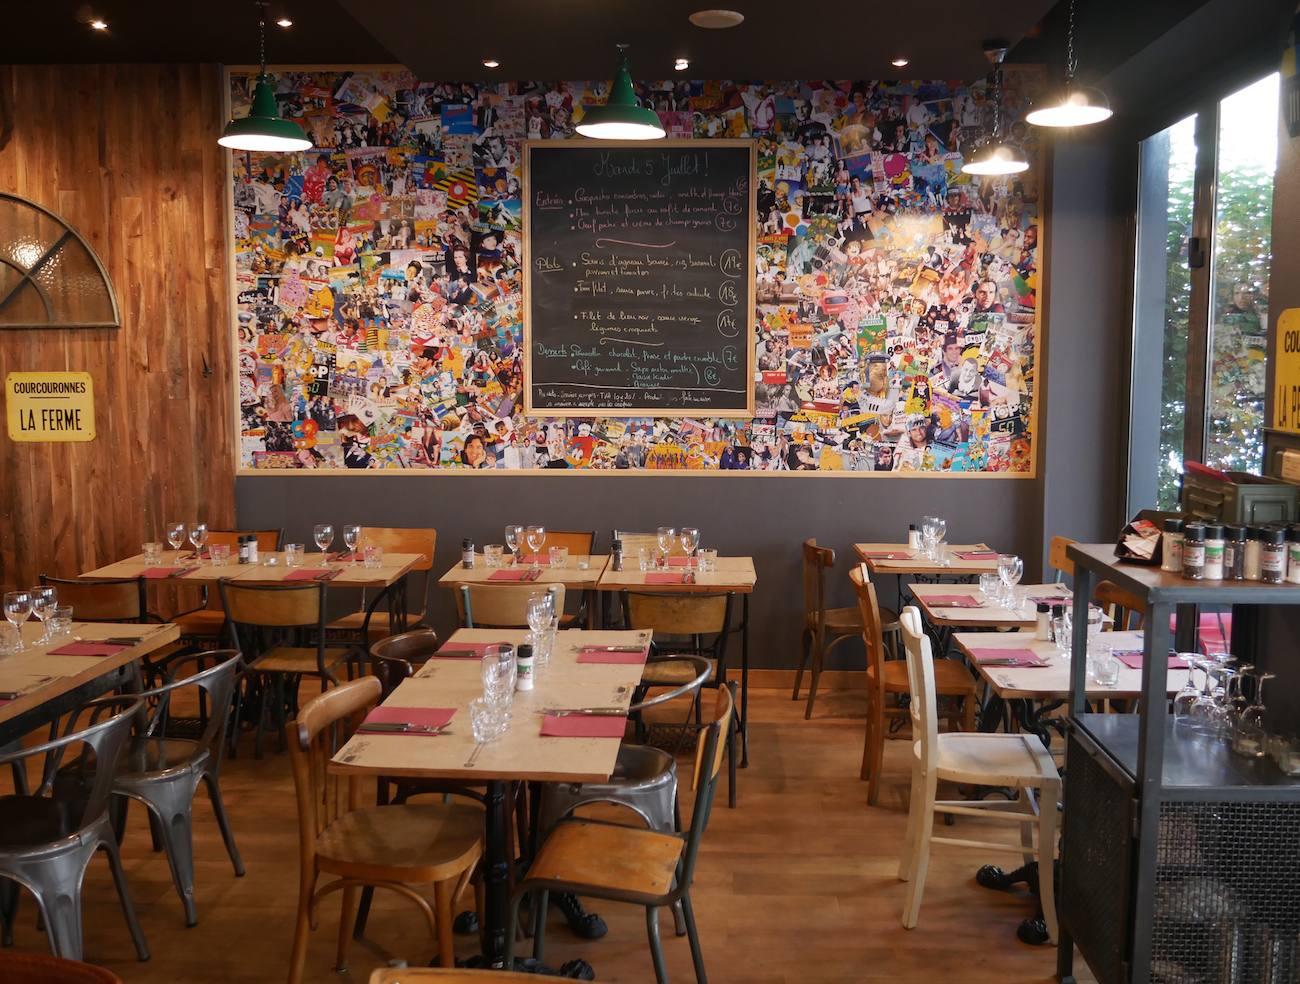 Restaurant Nantes - Les fils à maman - blog Nolwenn 5